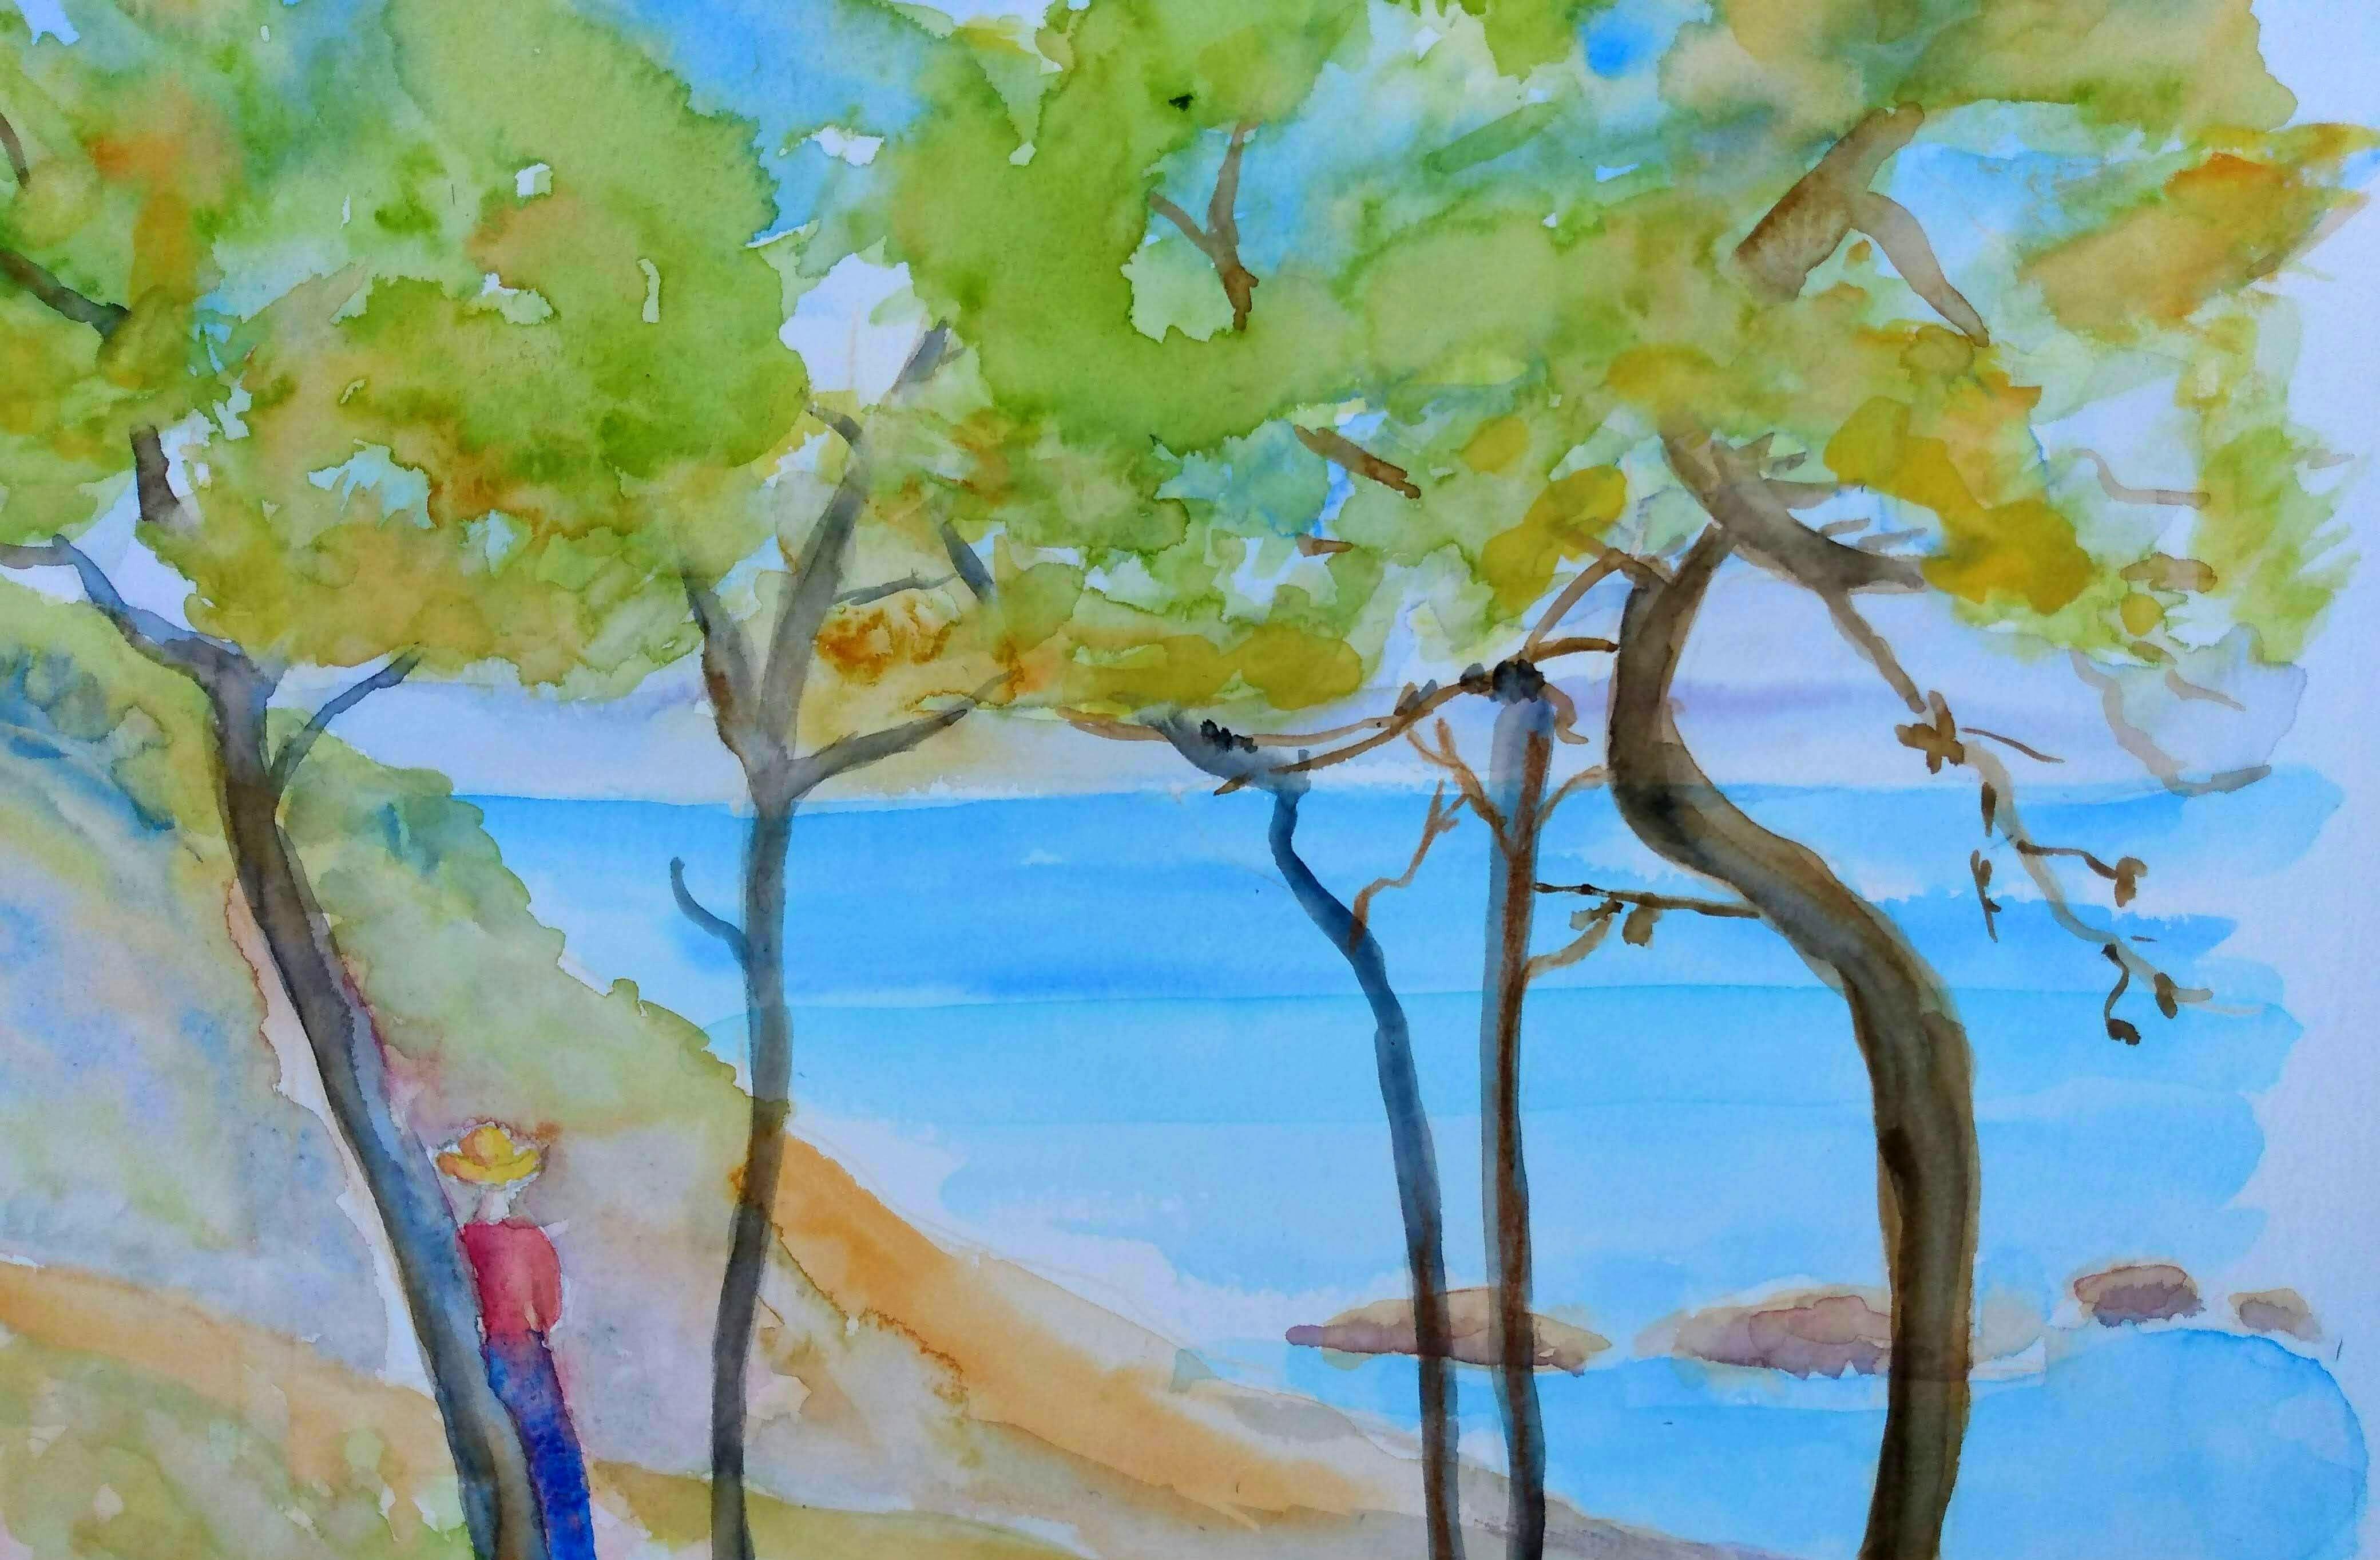 J.L, artiste-peintre